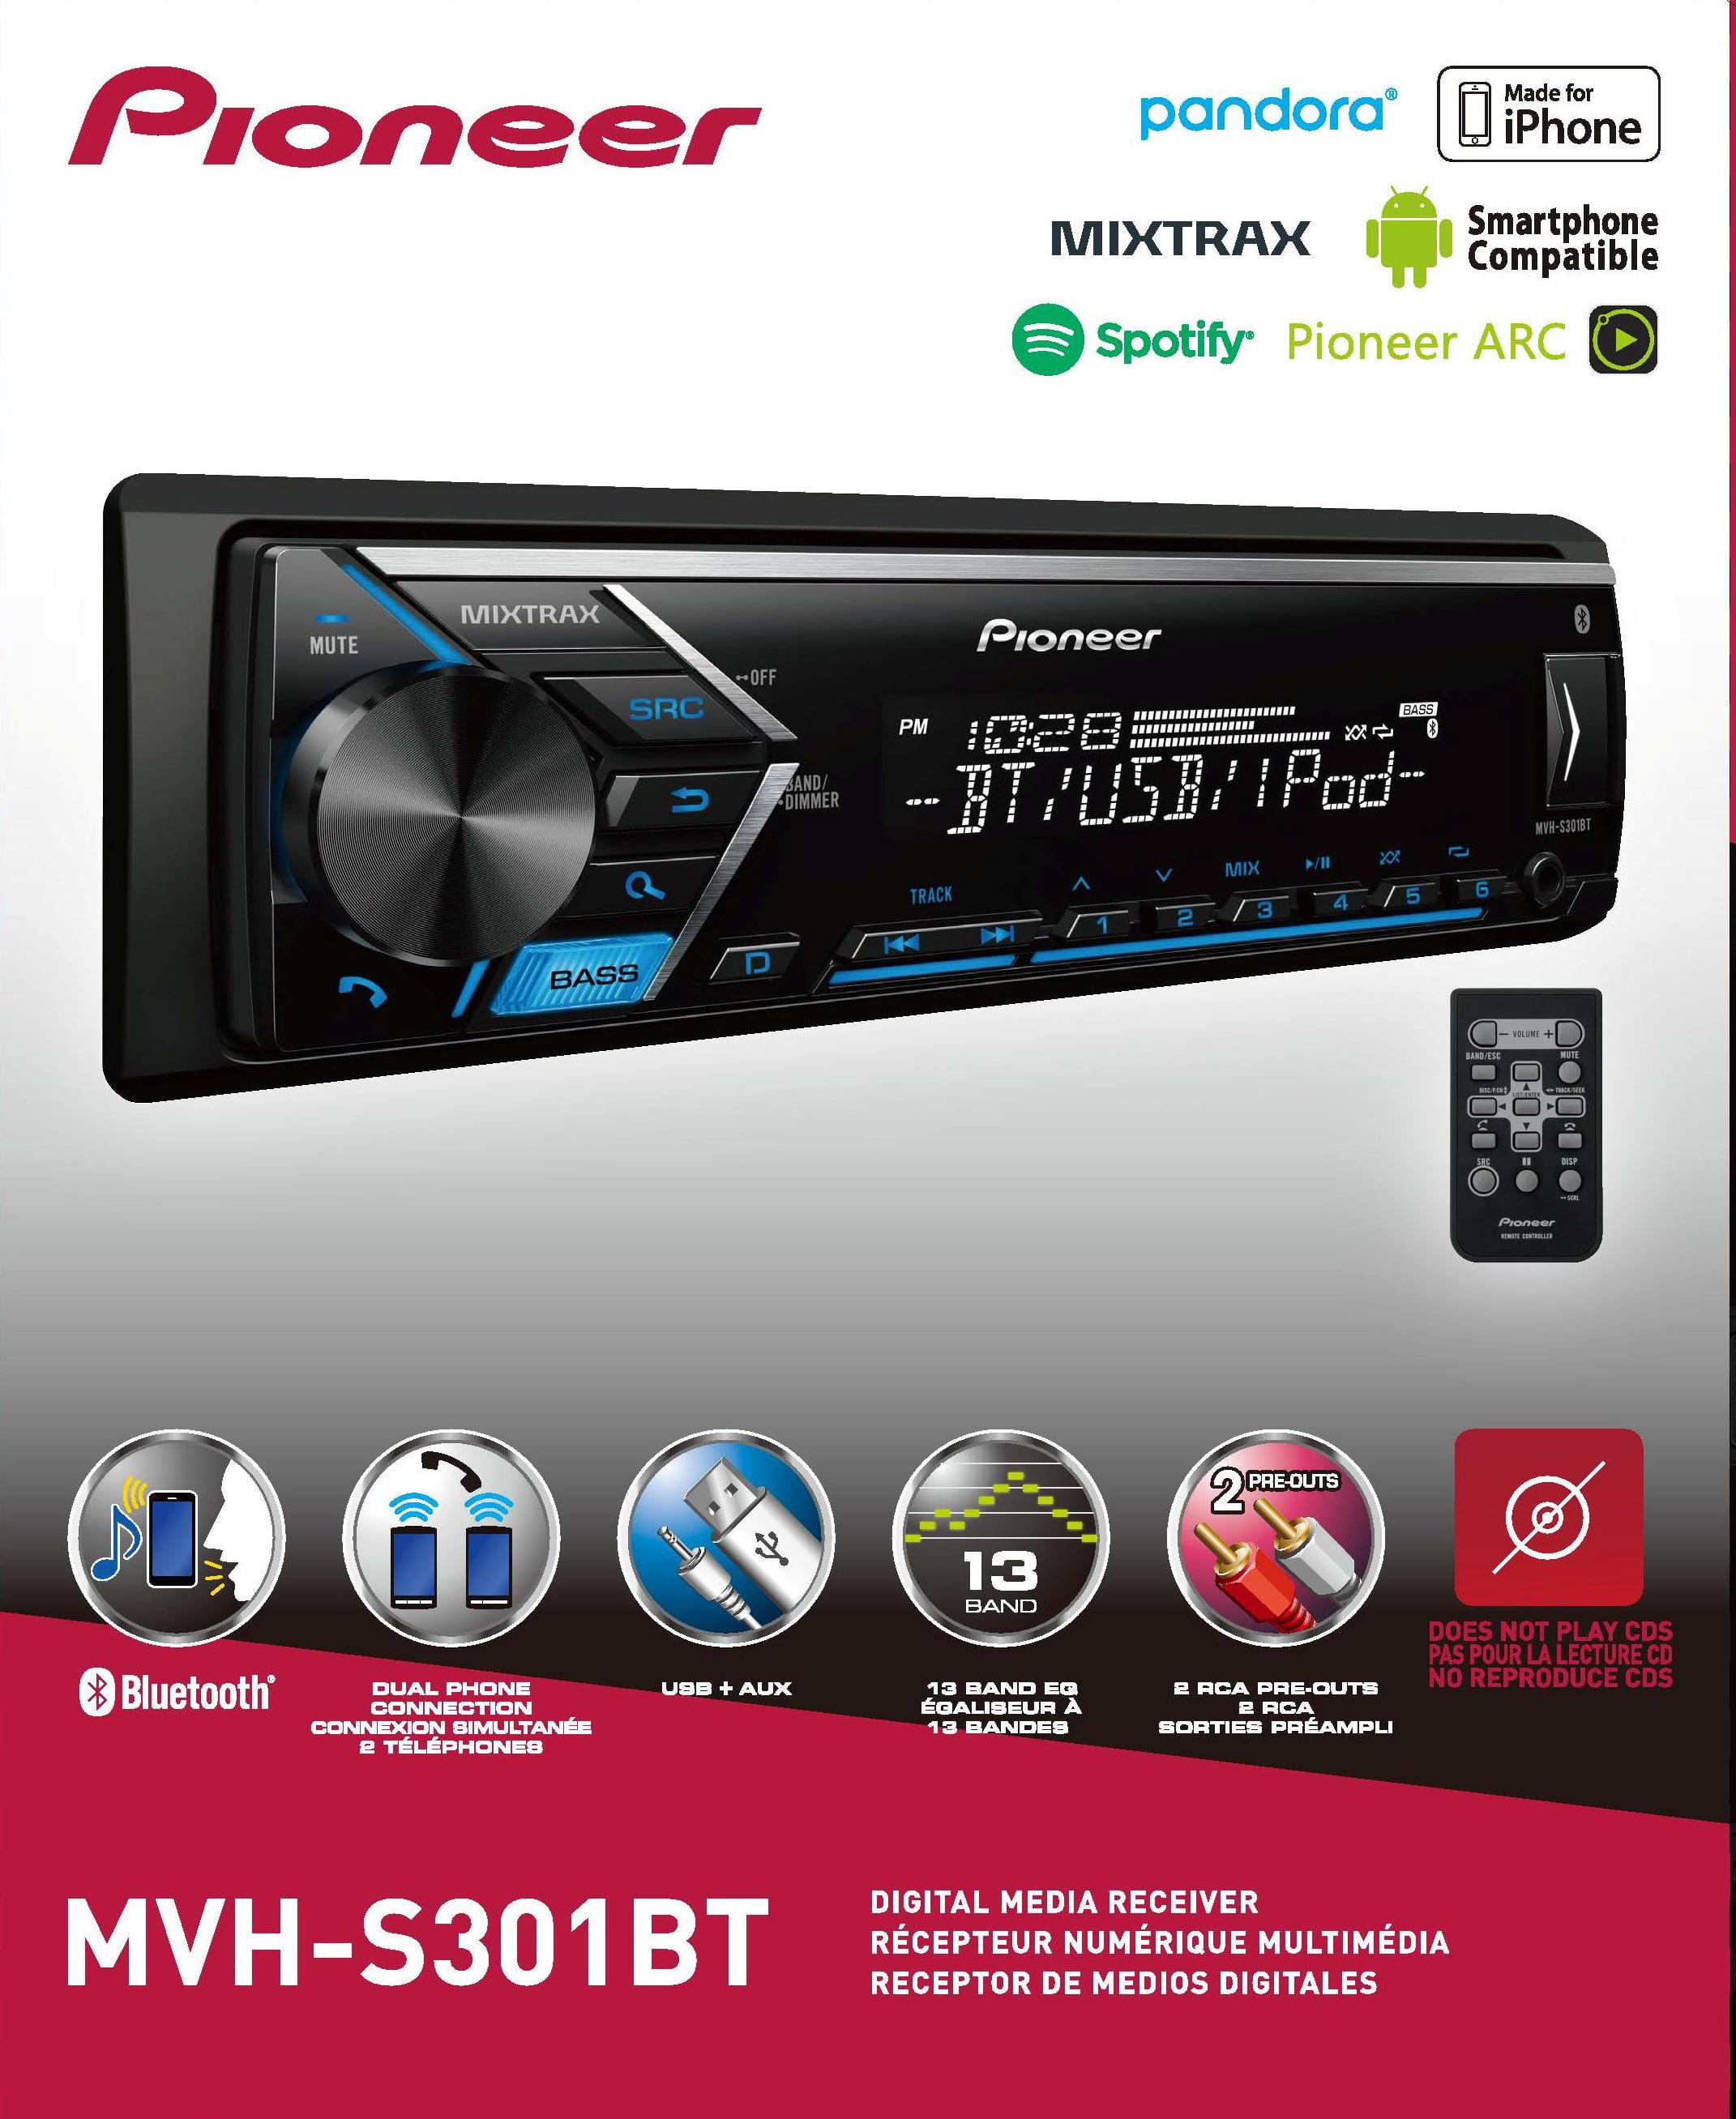 Pioneer MVH-S301BT Digital Media Receiver with Bluetooth by Pioneer